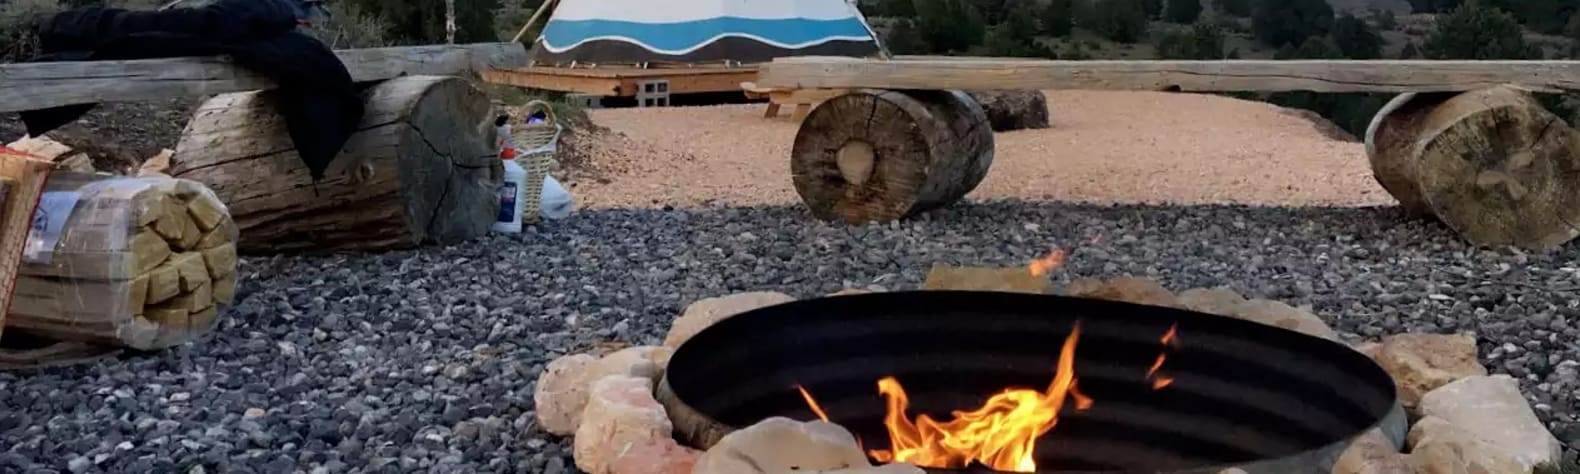 TIPI Site Near Bryce Canyon